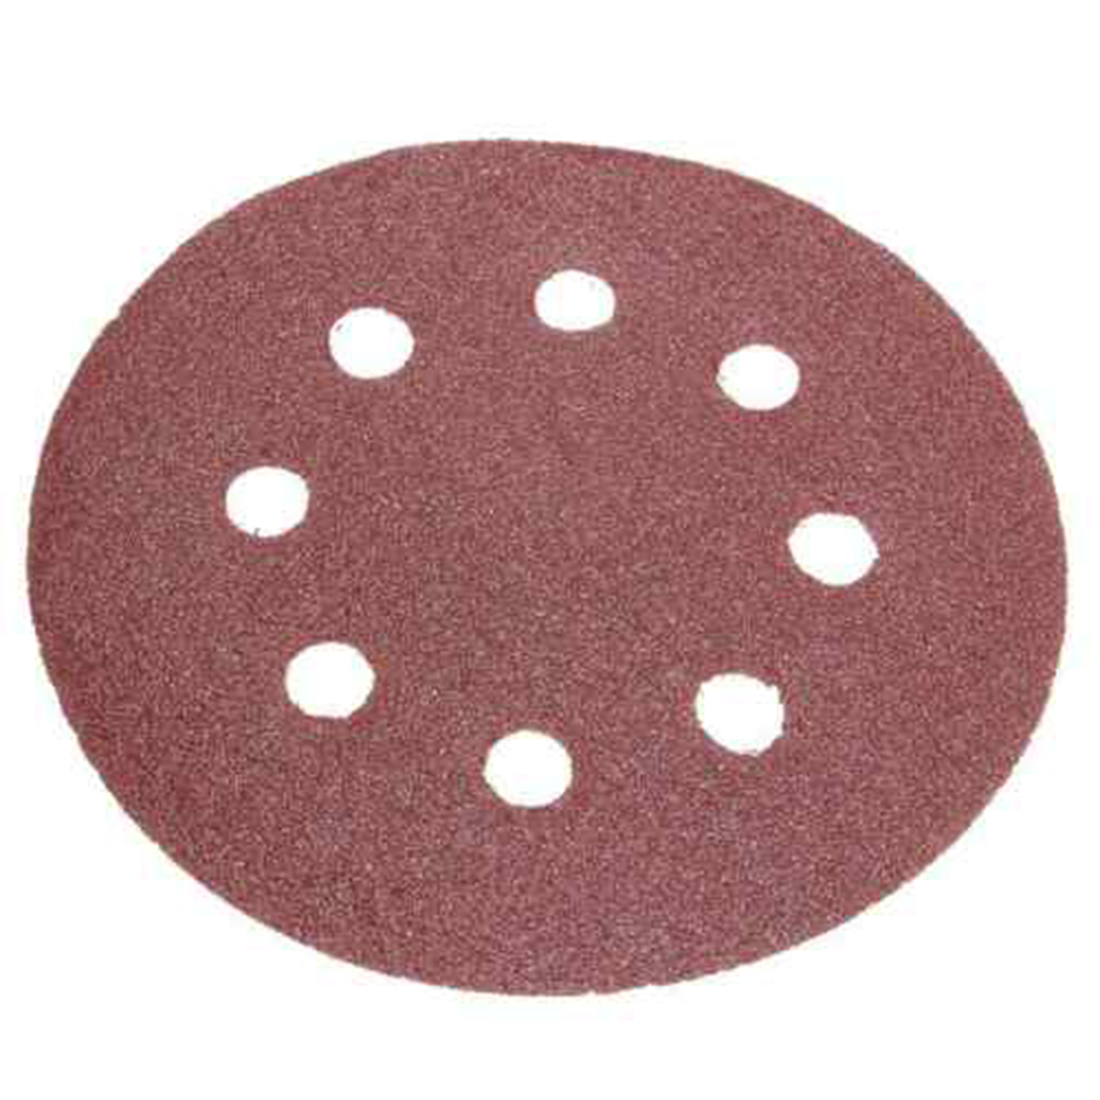 10pcs Hook & Loop 9 Inch 10 Hole 40 Grits Sand Paper Sanding Discs Sanderpaper